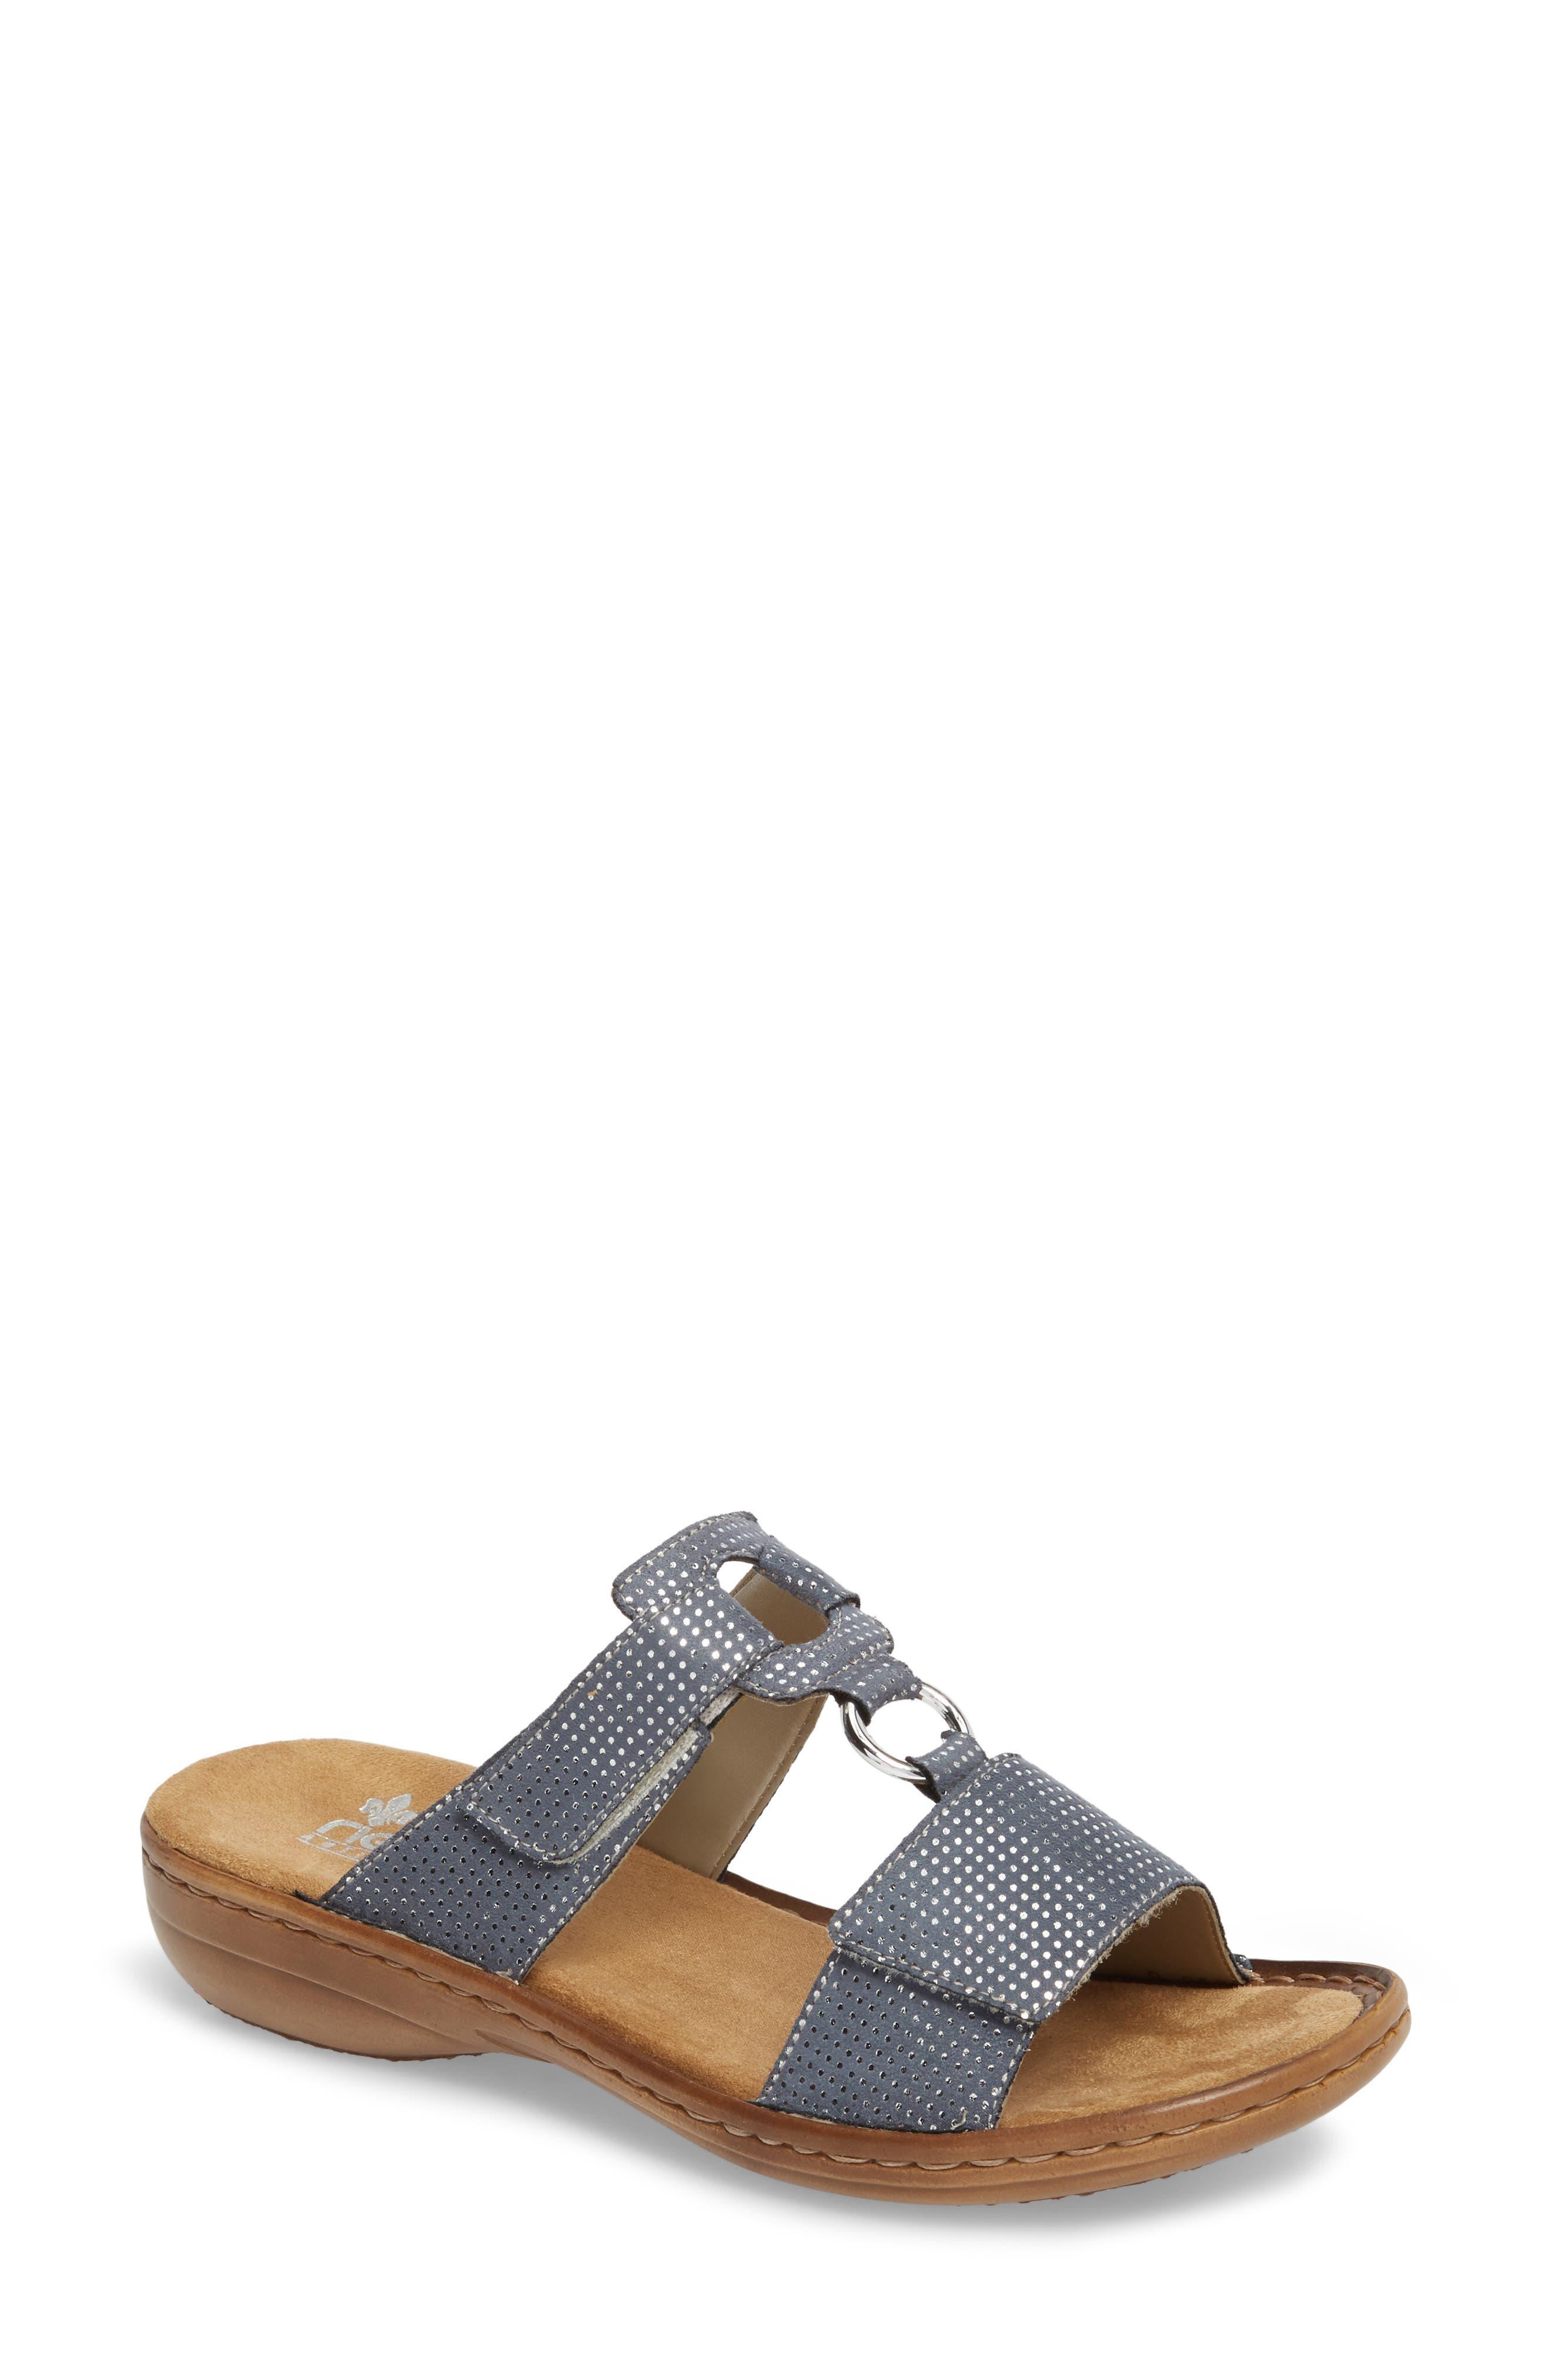 Regina P9 Slide Sandal,                         Main,                         color, White Denim Fabric